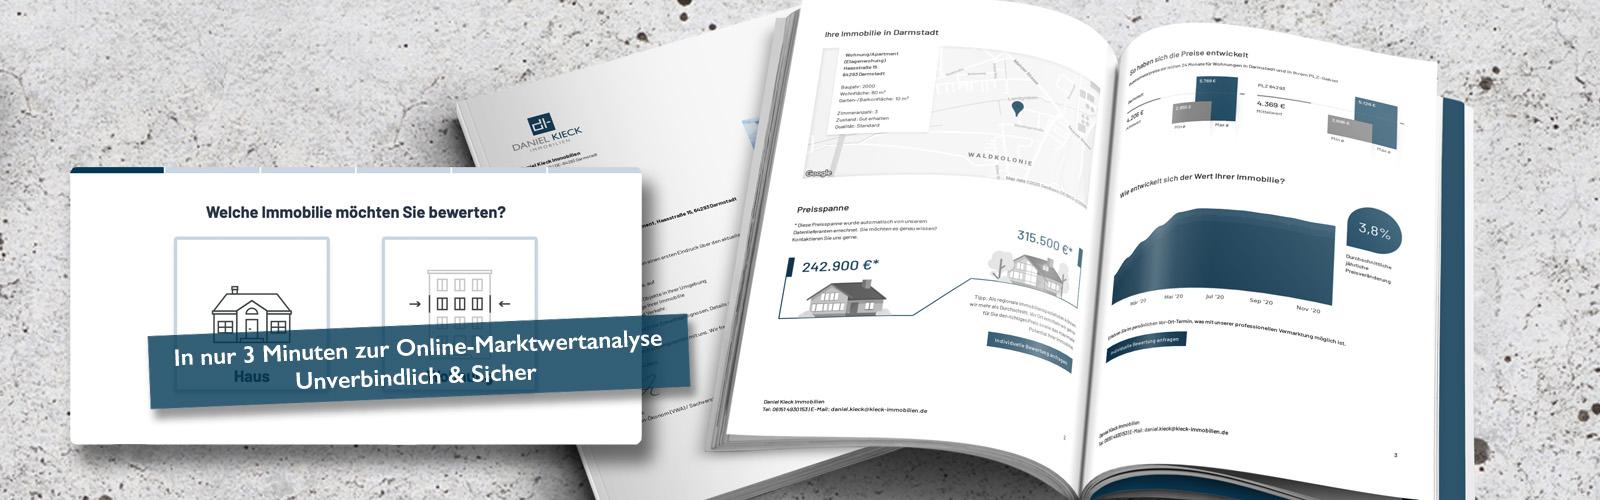 Daniel Kieck Immobilien - Online-Marktwertanalyse